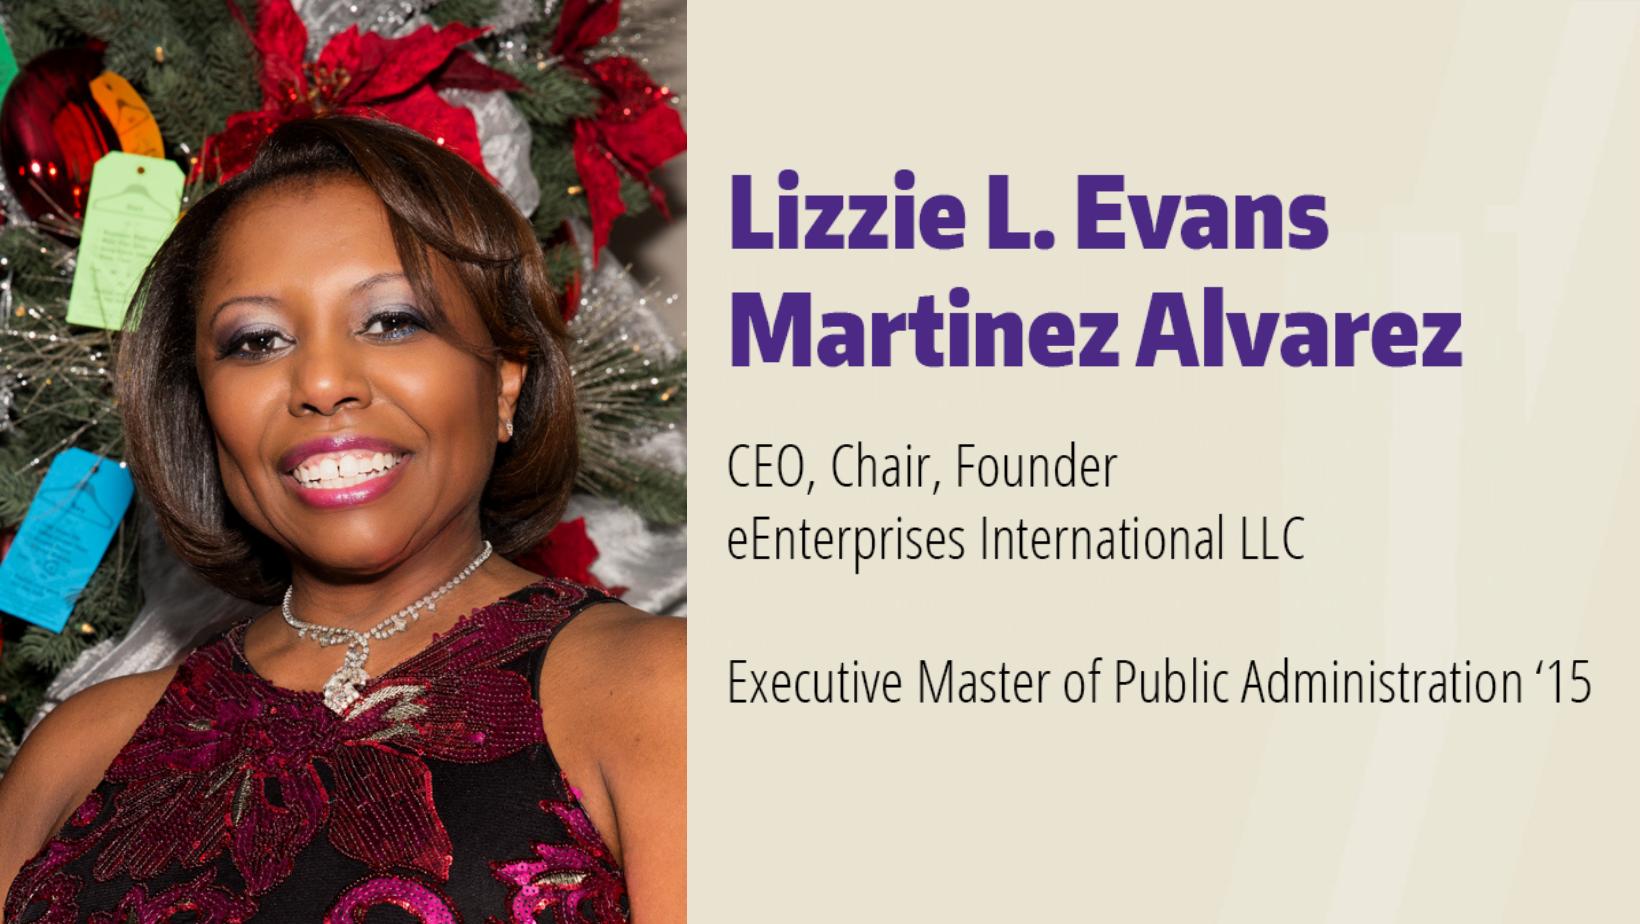 Lizzie L. Evans Martinez Alvarez